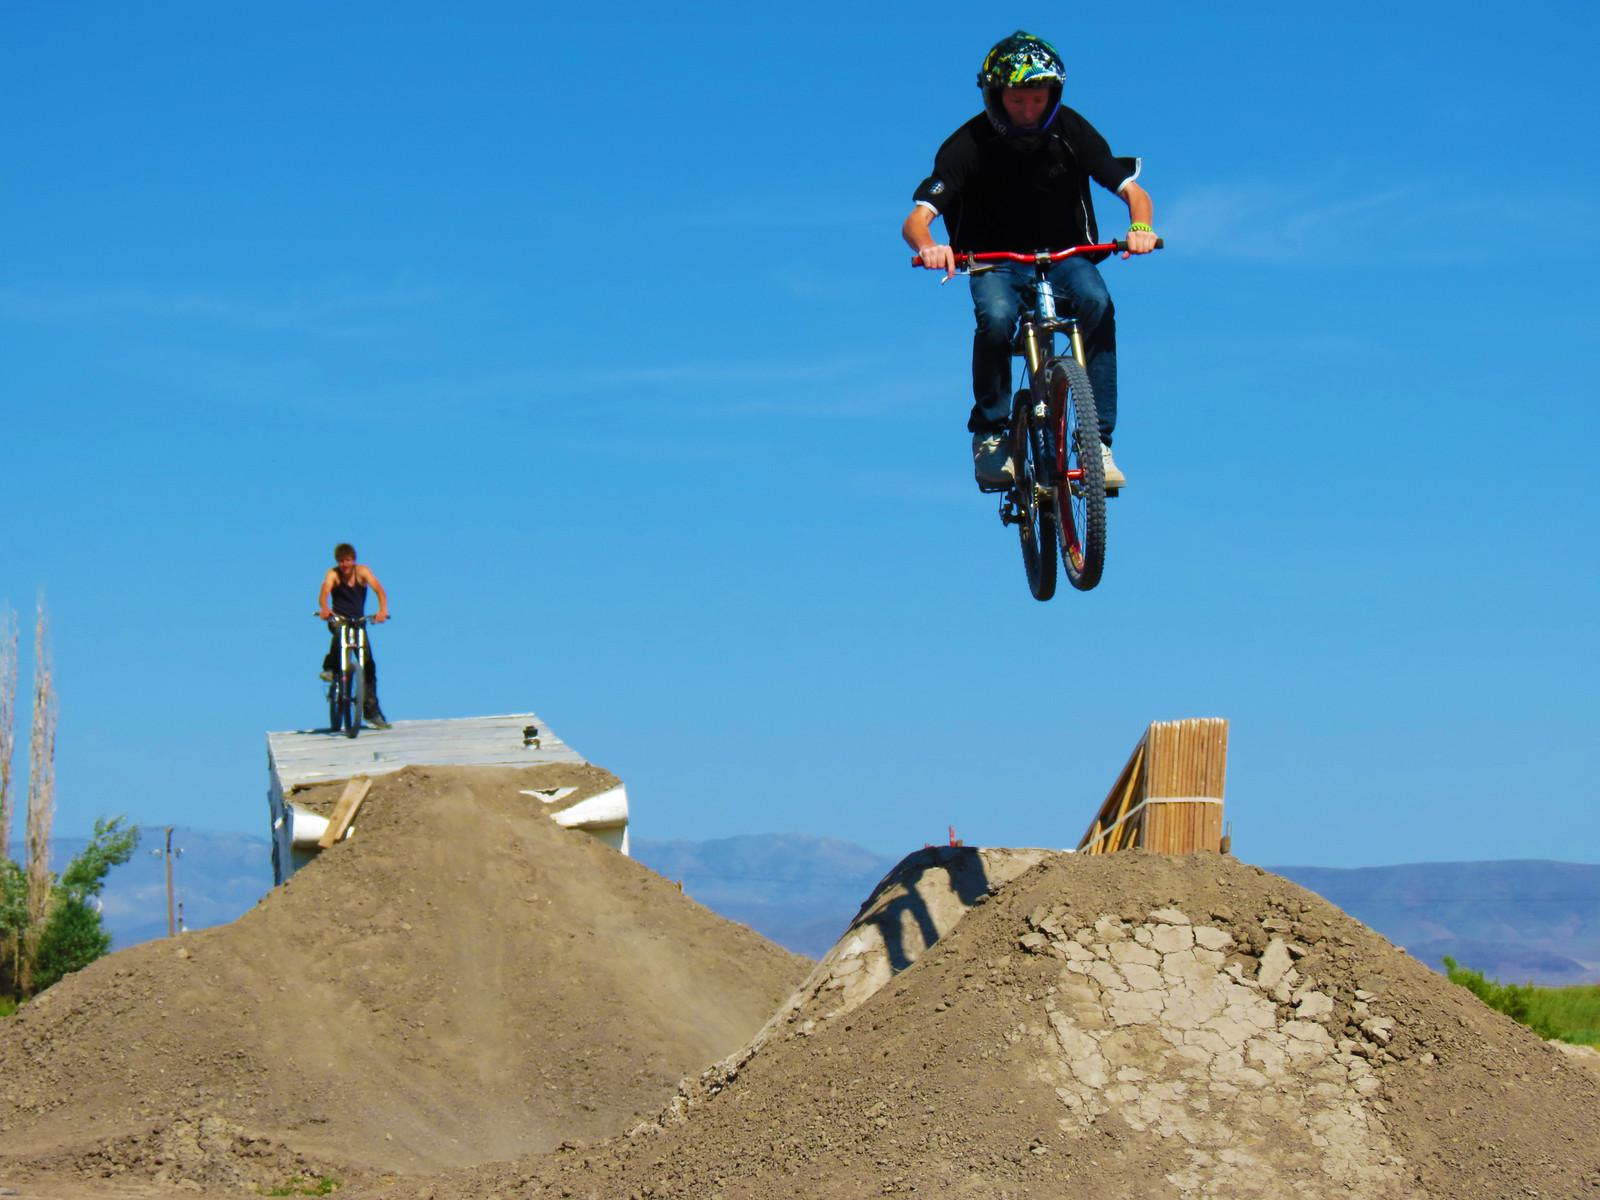 Day 4 001 - Moosey - Mountain Biking Pictures - Vital MTB